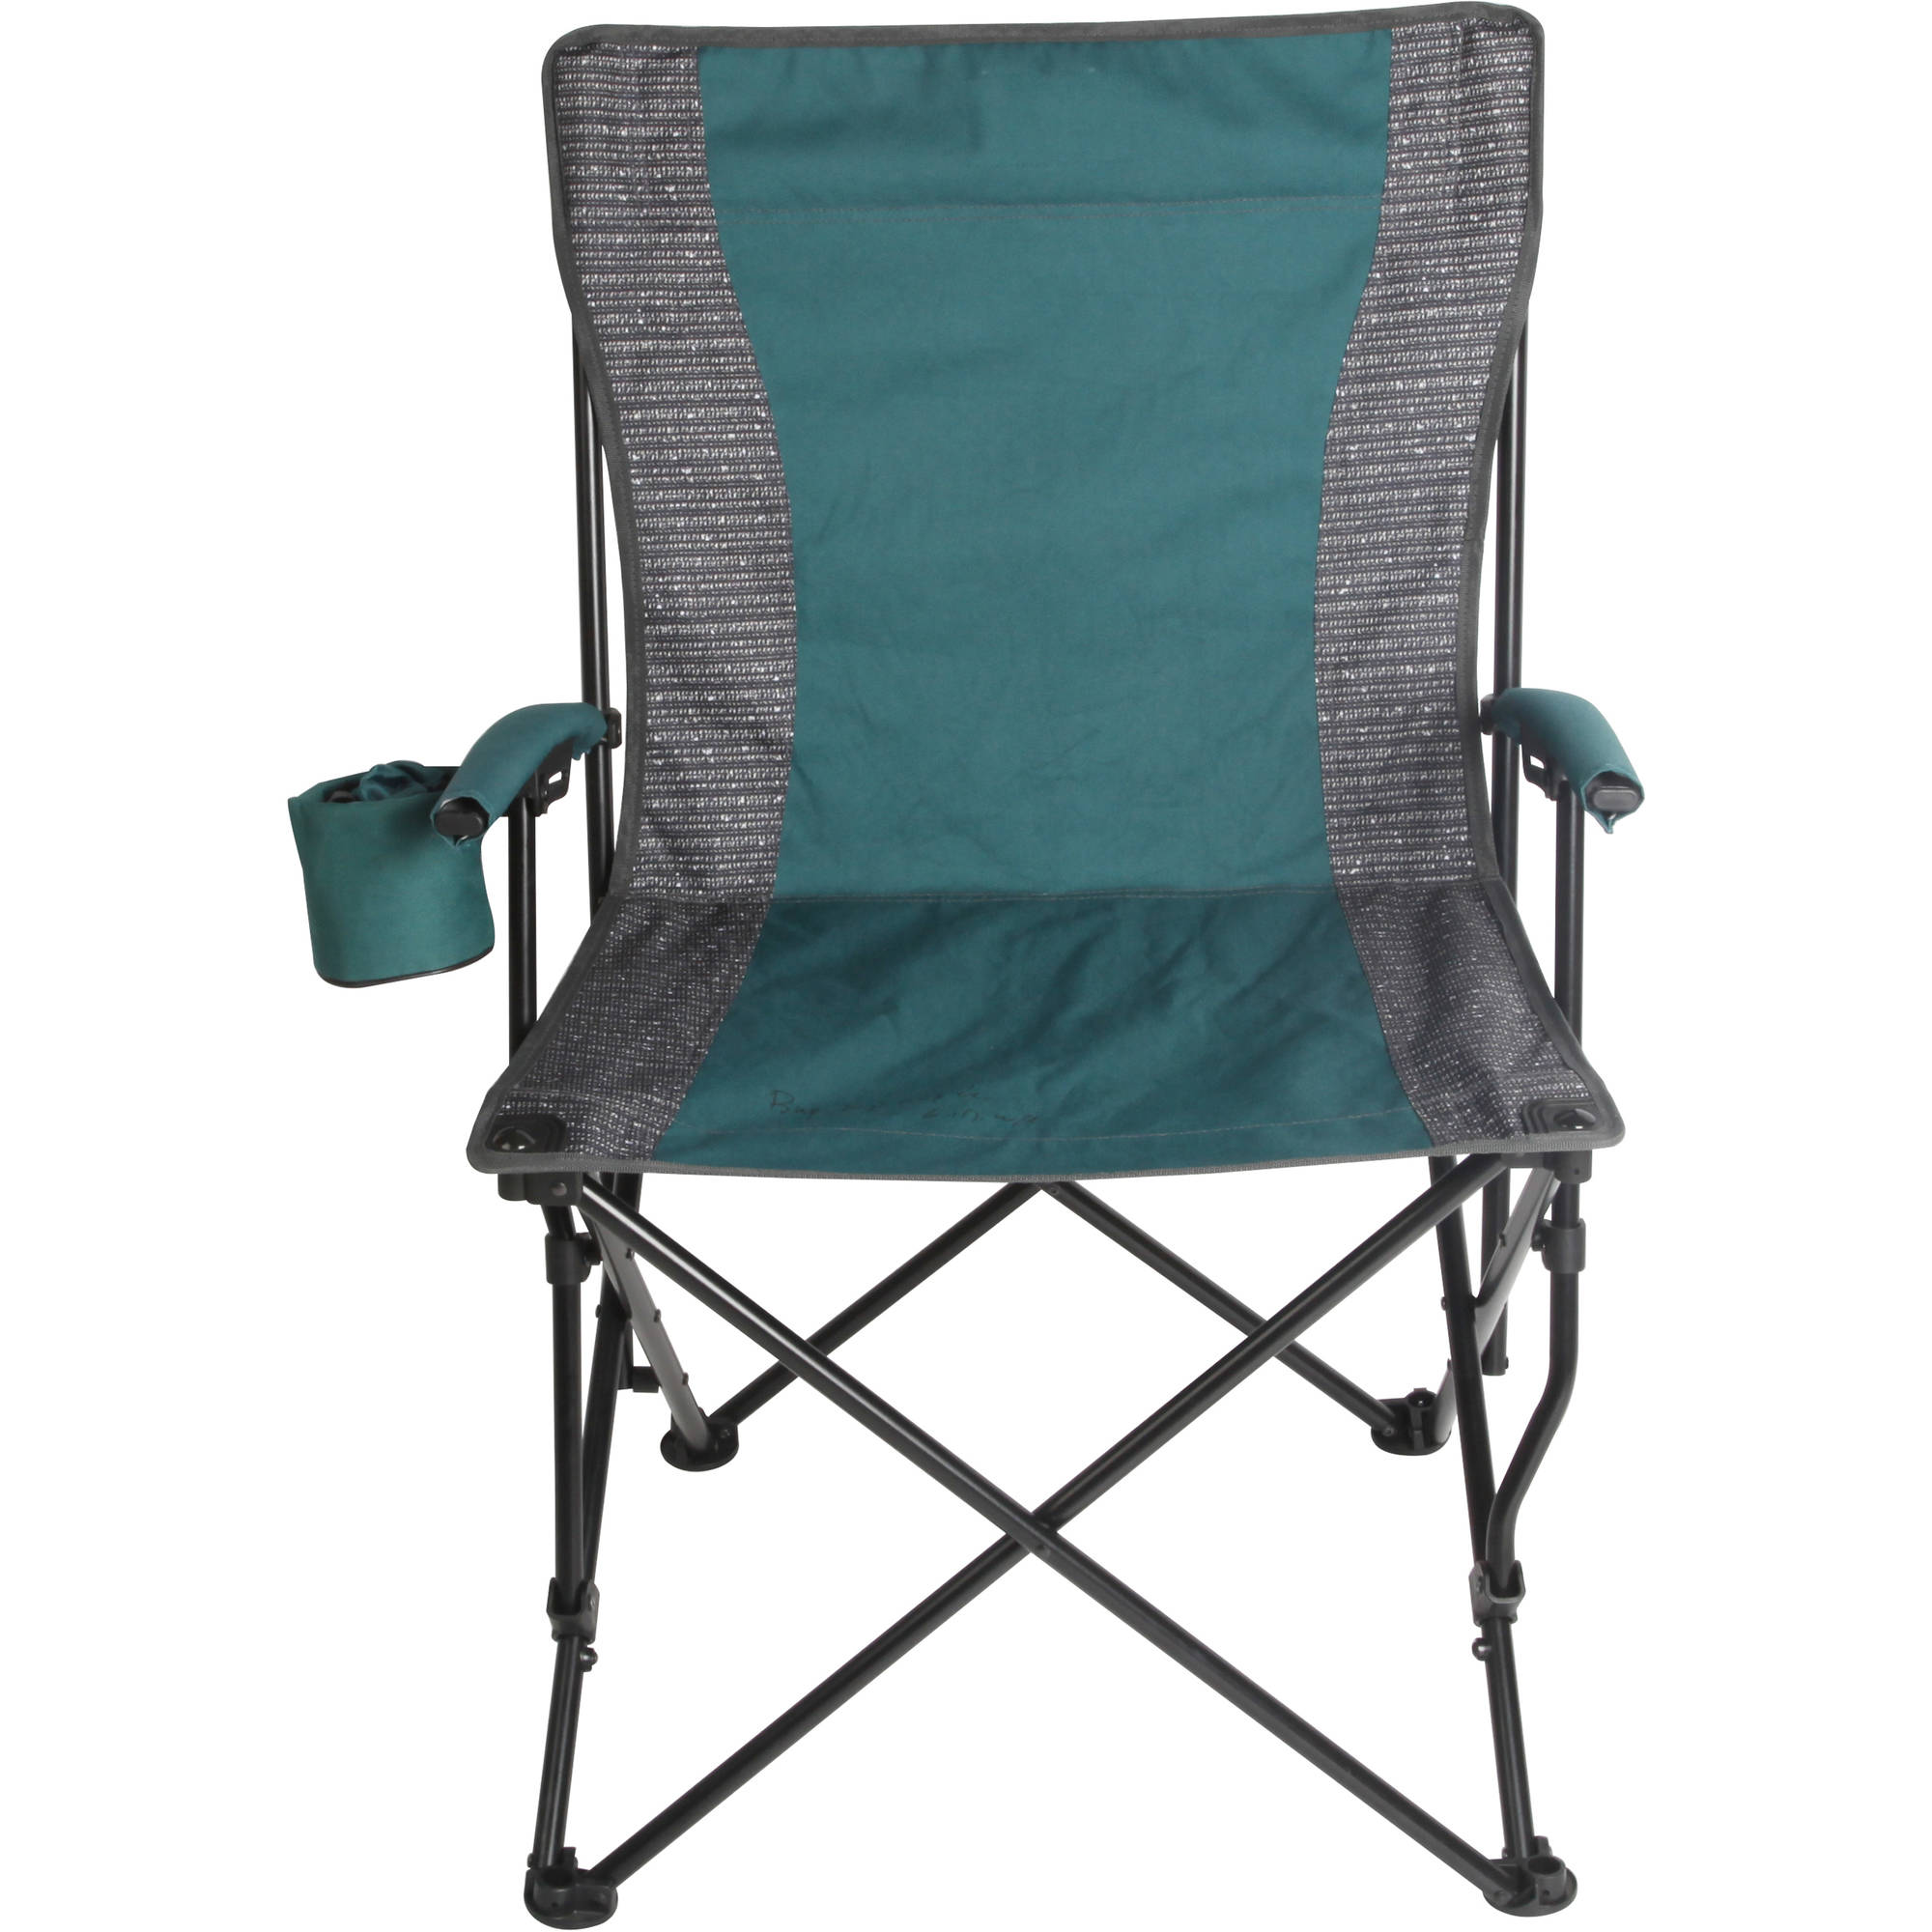 Ozark Trail Basic Hard Arm Chair